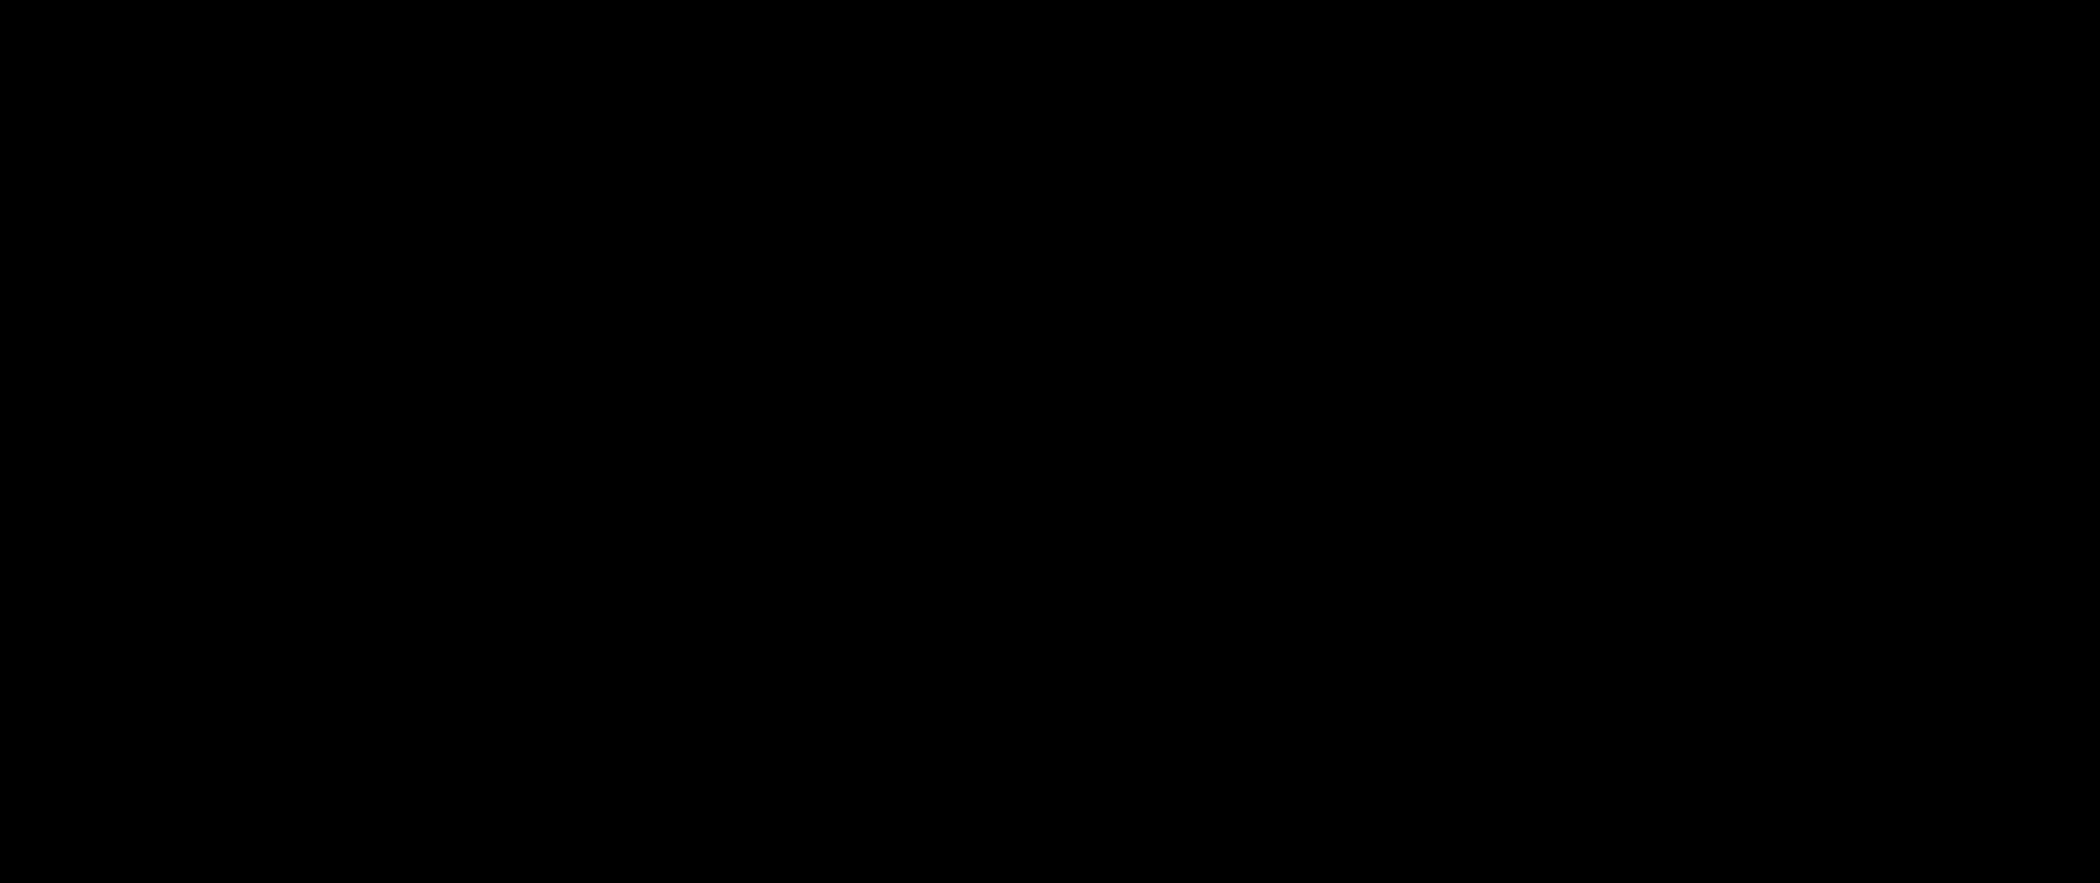 zara logo 1 1 - Zara Logo